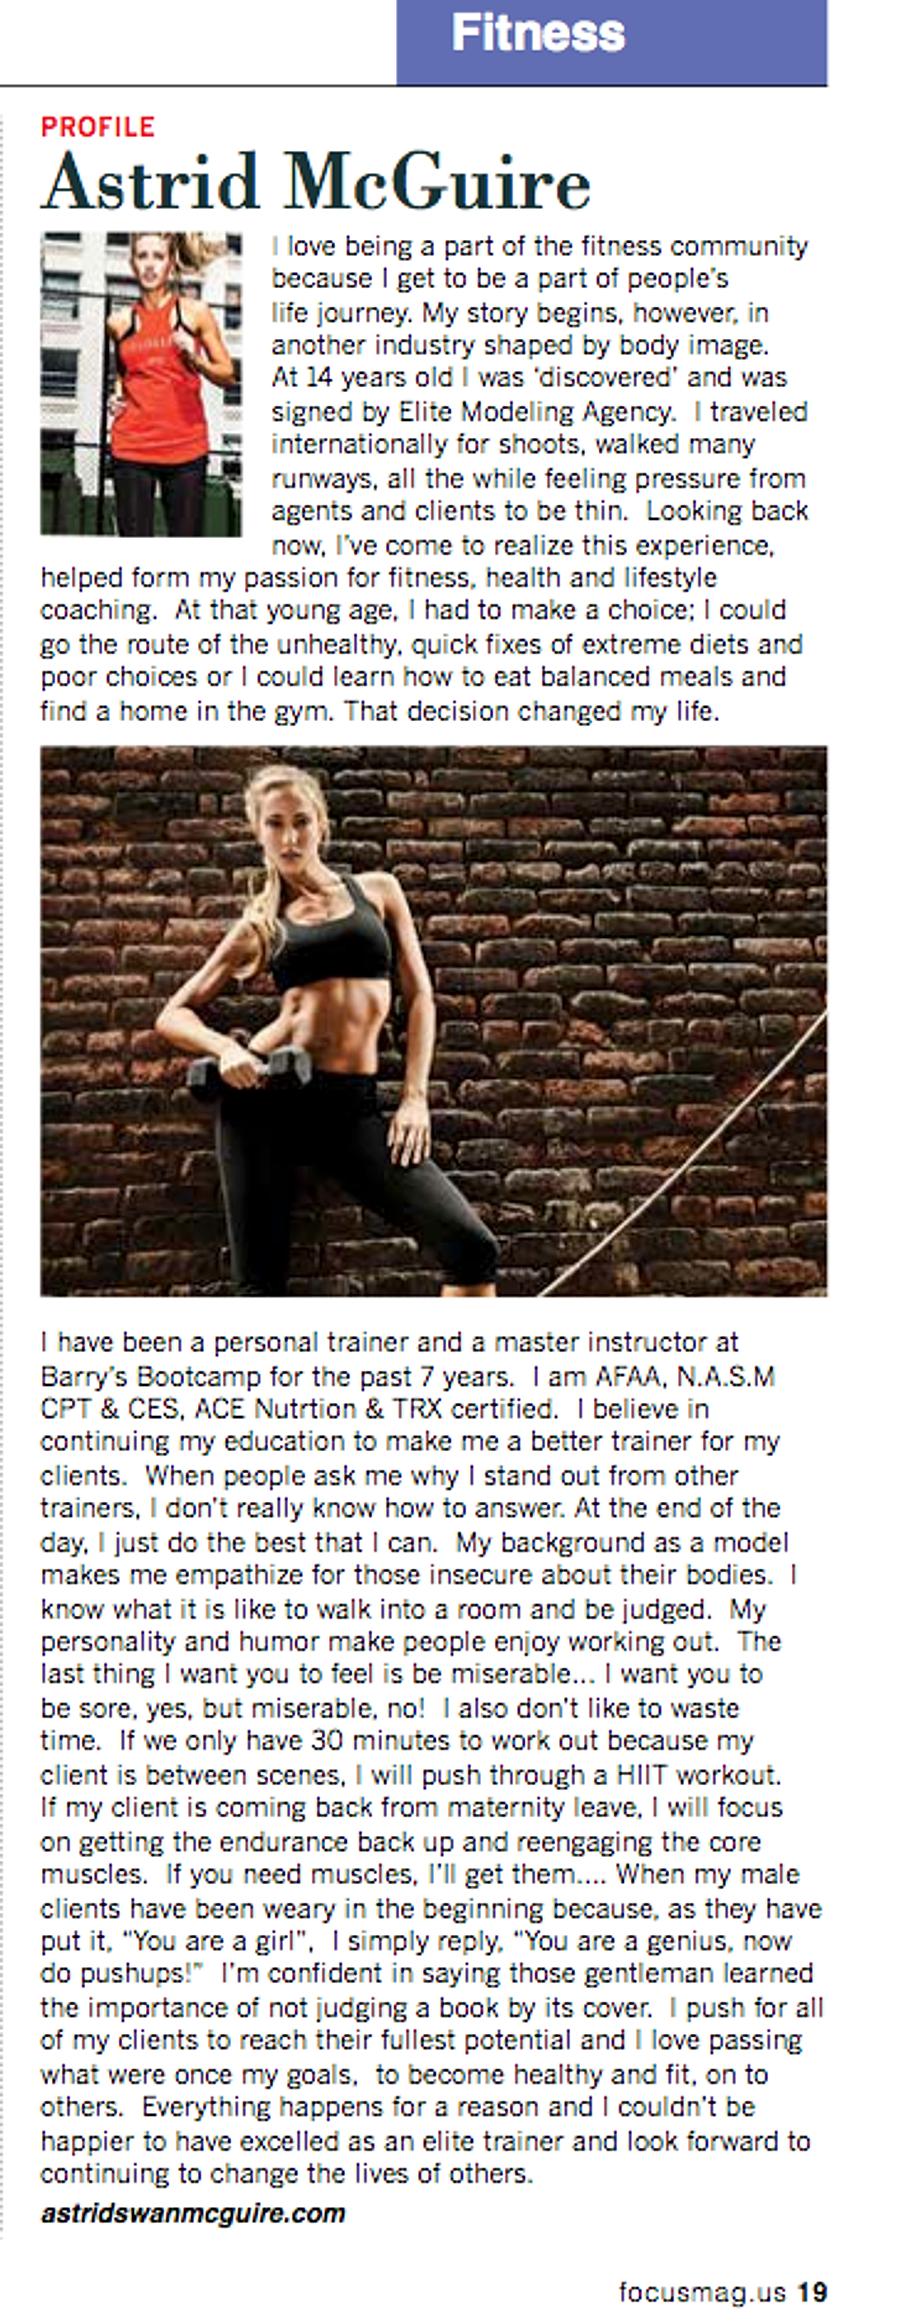 Astrid McGuire - May 2014, Focus US